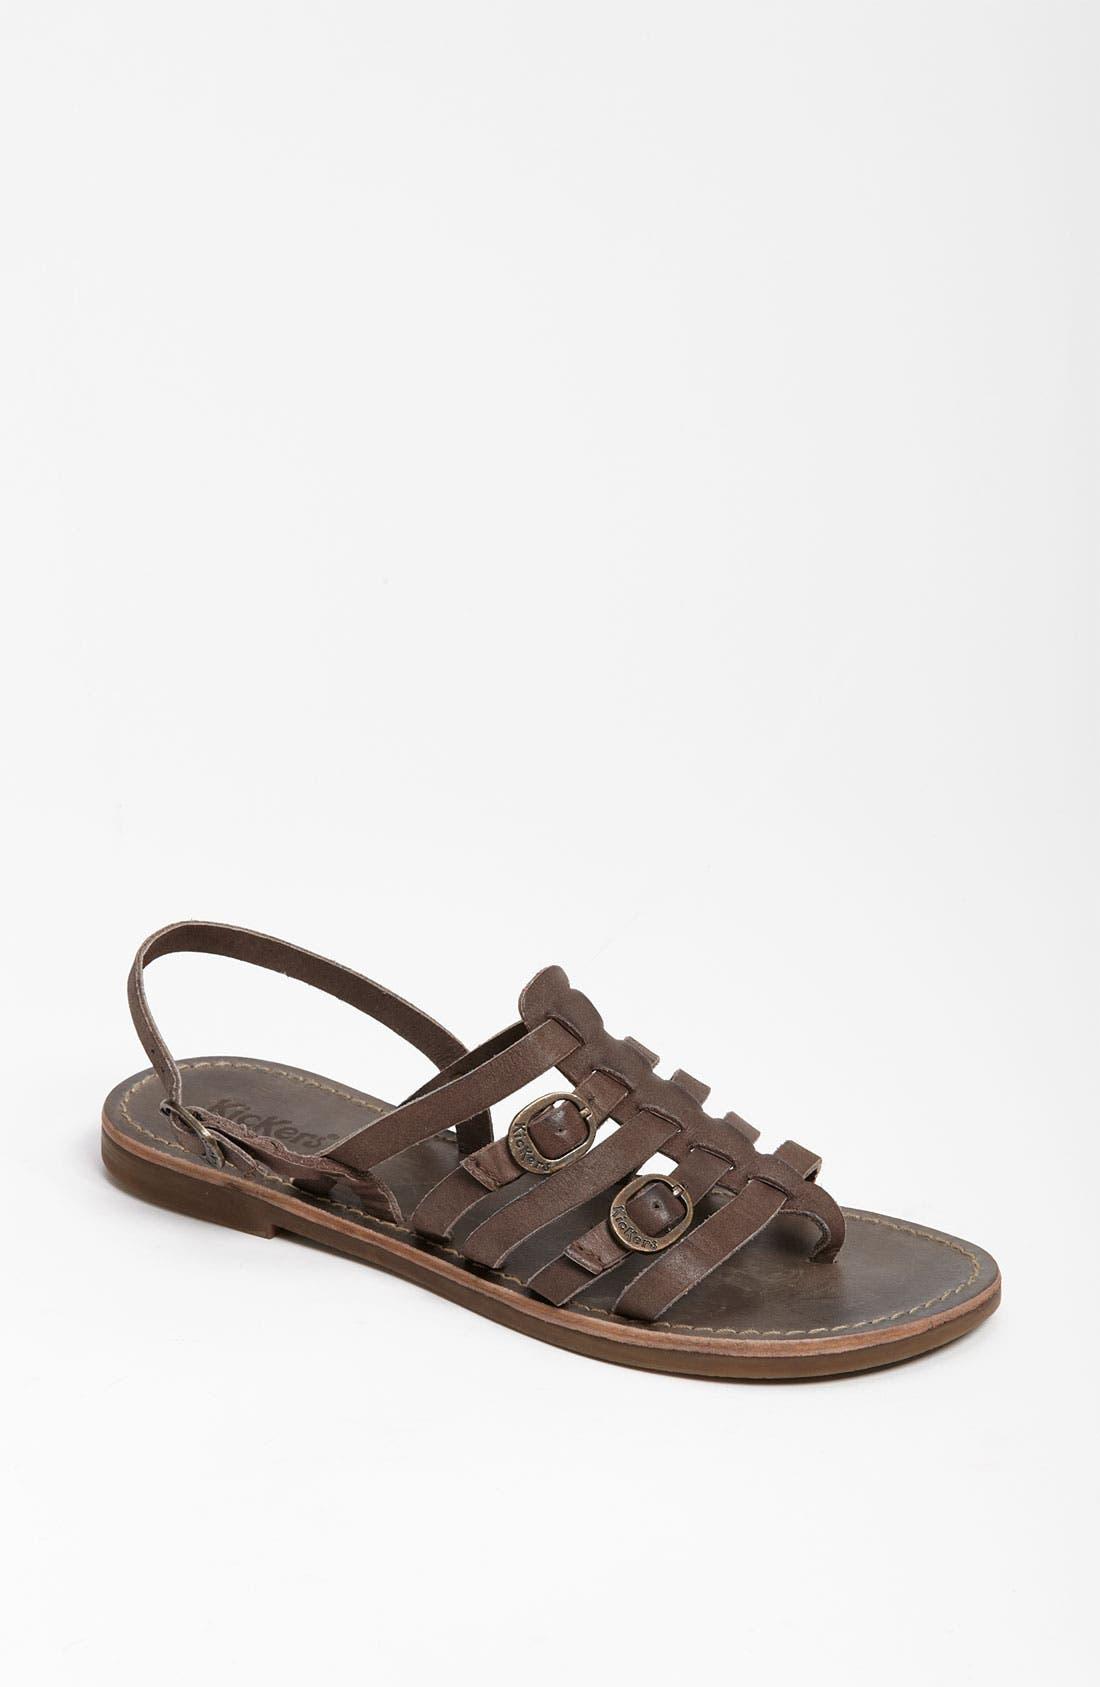 Main Image - Kickers 'Dixmille' Sandal